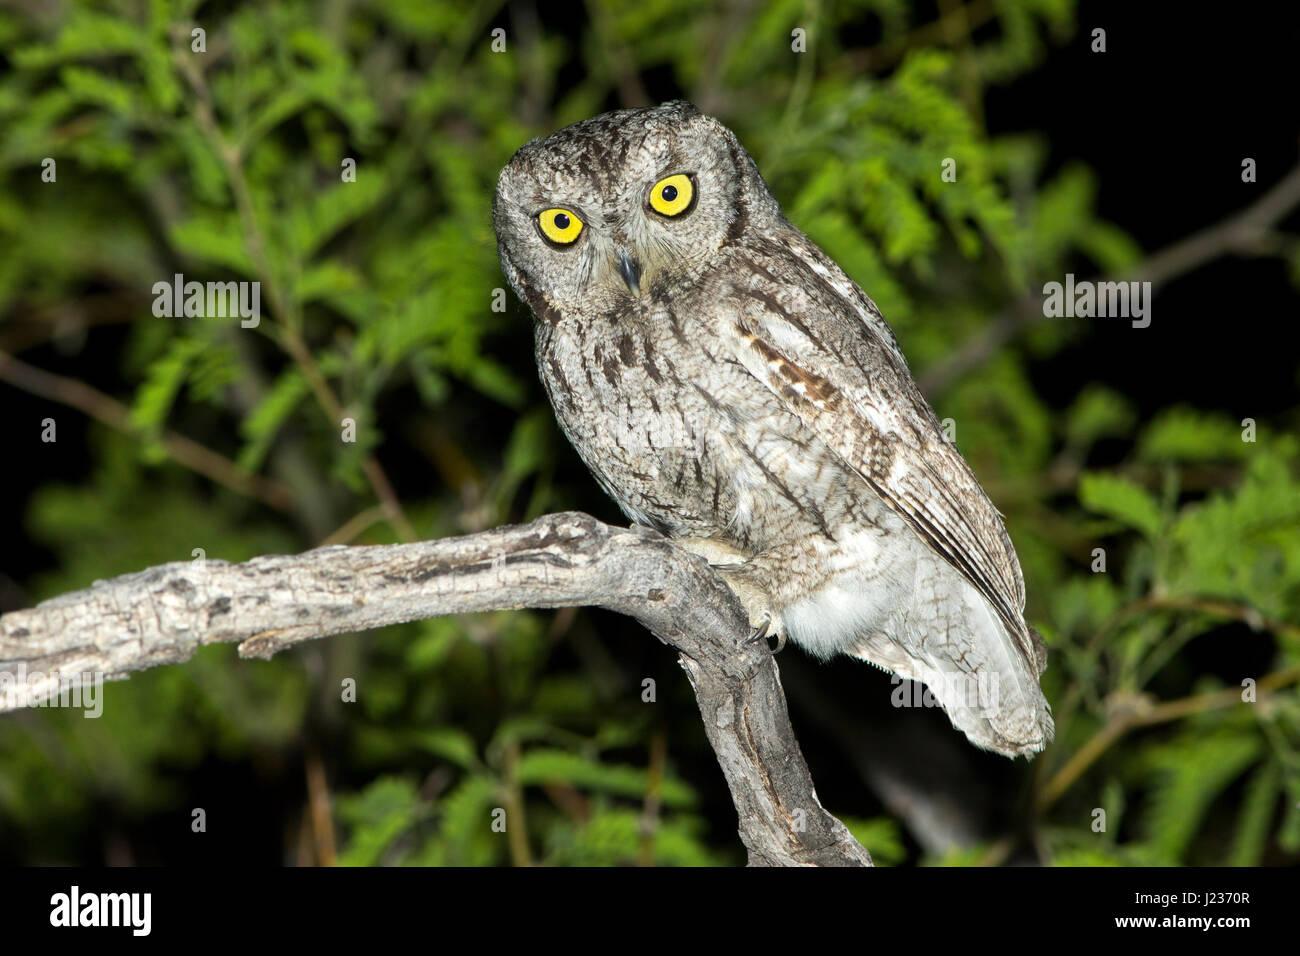 Western Screech-Owl  Megascops kennikottii Tucson, Pima County, Arizona, United States 13 April       Adult     - Stock Image